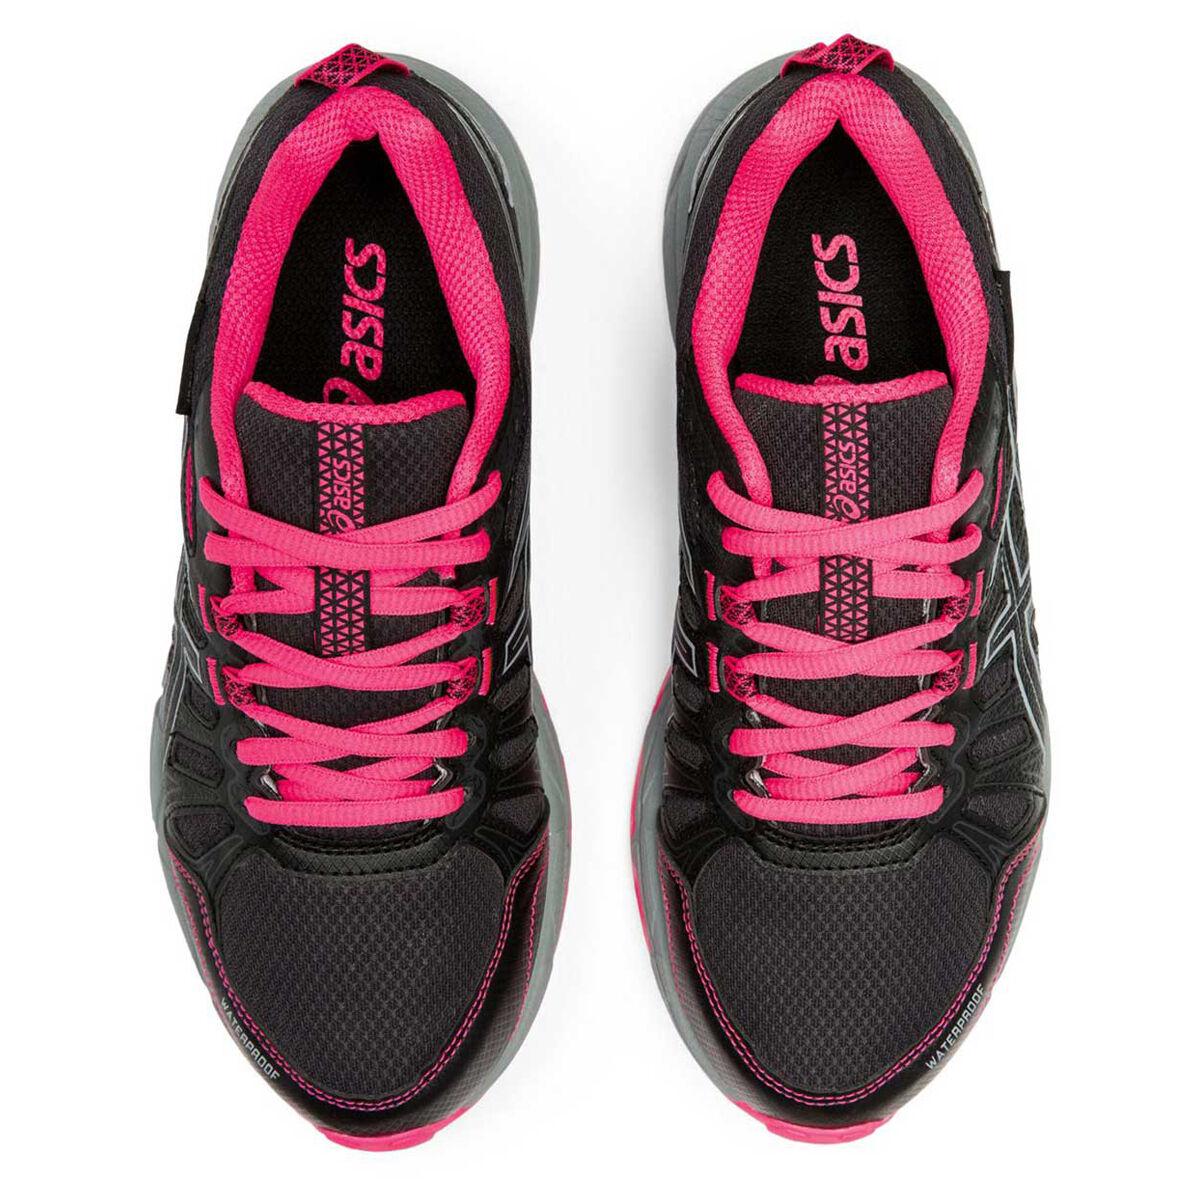 Asics GEL Venture 7 Kids Running Shoes